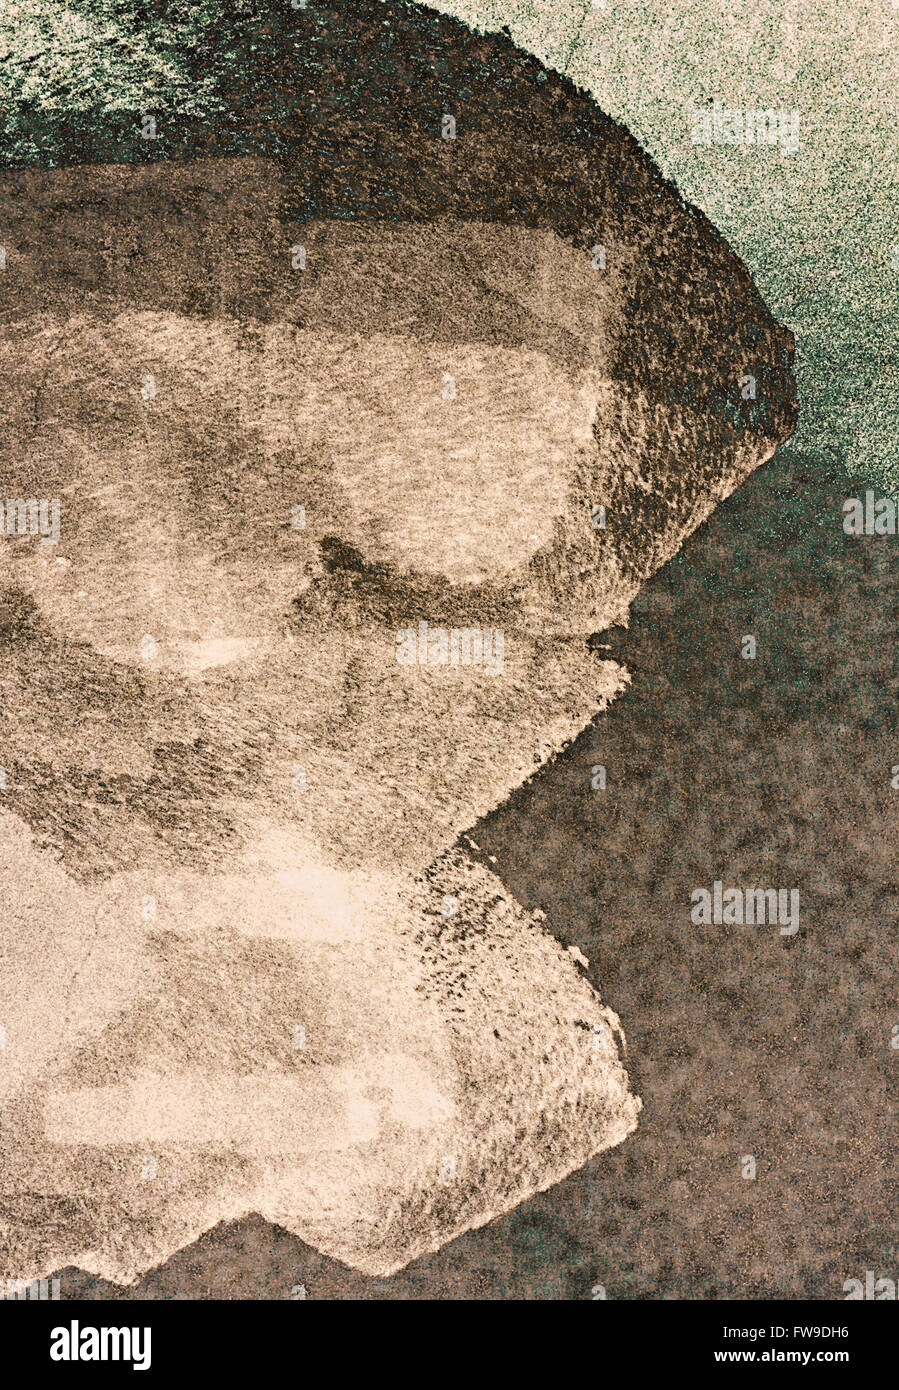 Modern abstract graphic design digital art concept créatif Photo Stock